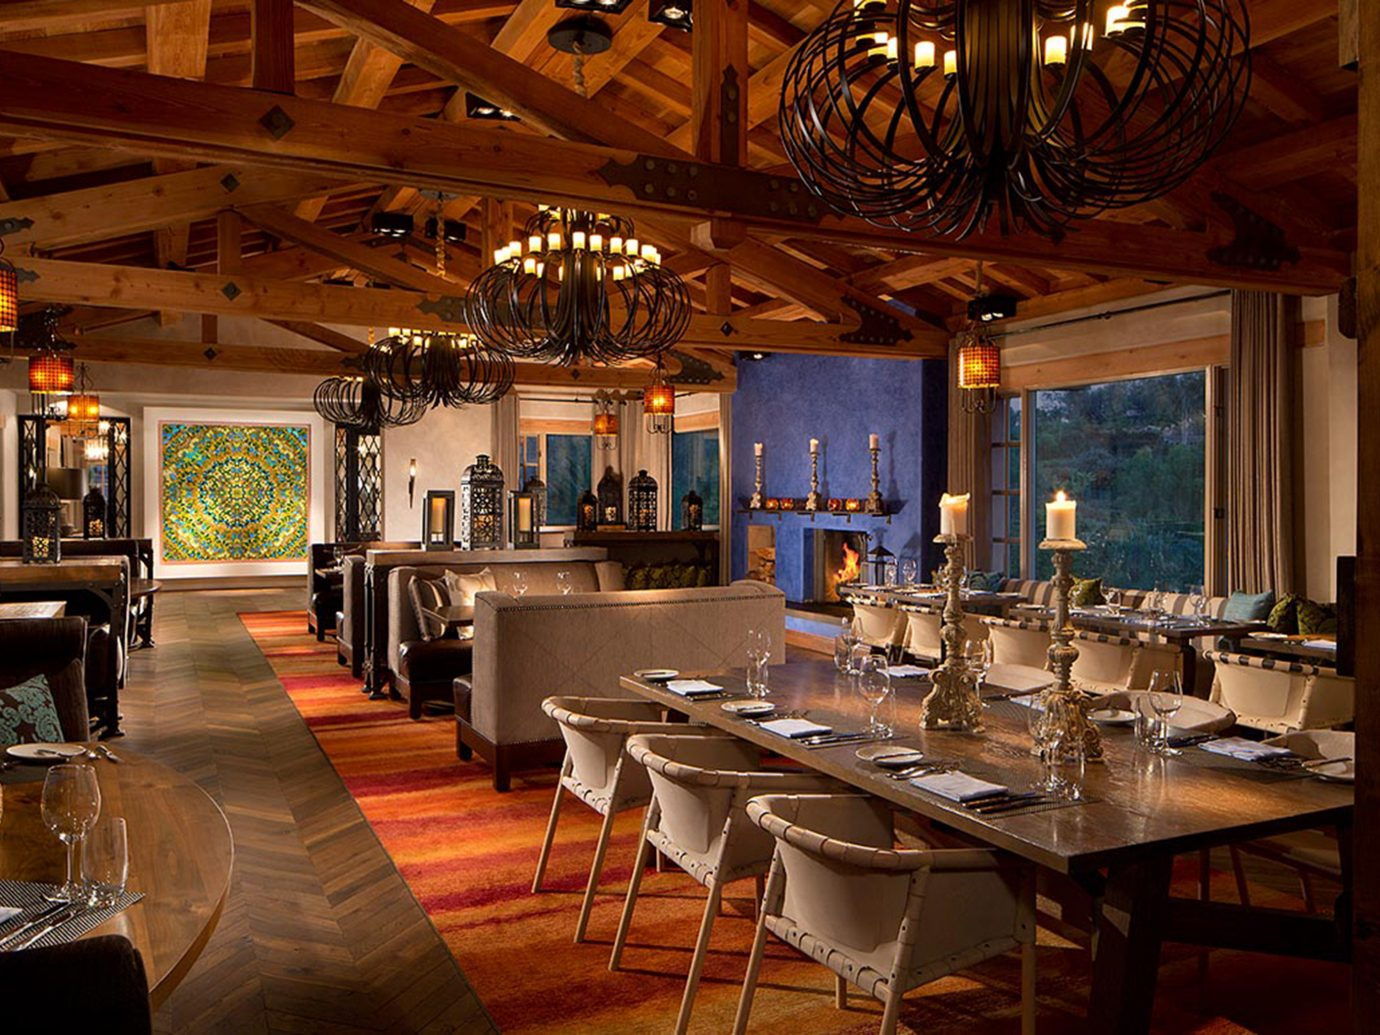 Bar Dining Drink Eat Elegant Trip Ideas table indoor floor ceiling room restaurant estate Resort tavern interior design meal café Island several dining room dining table